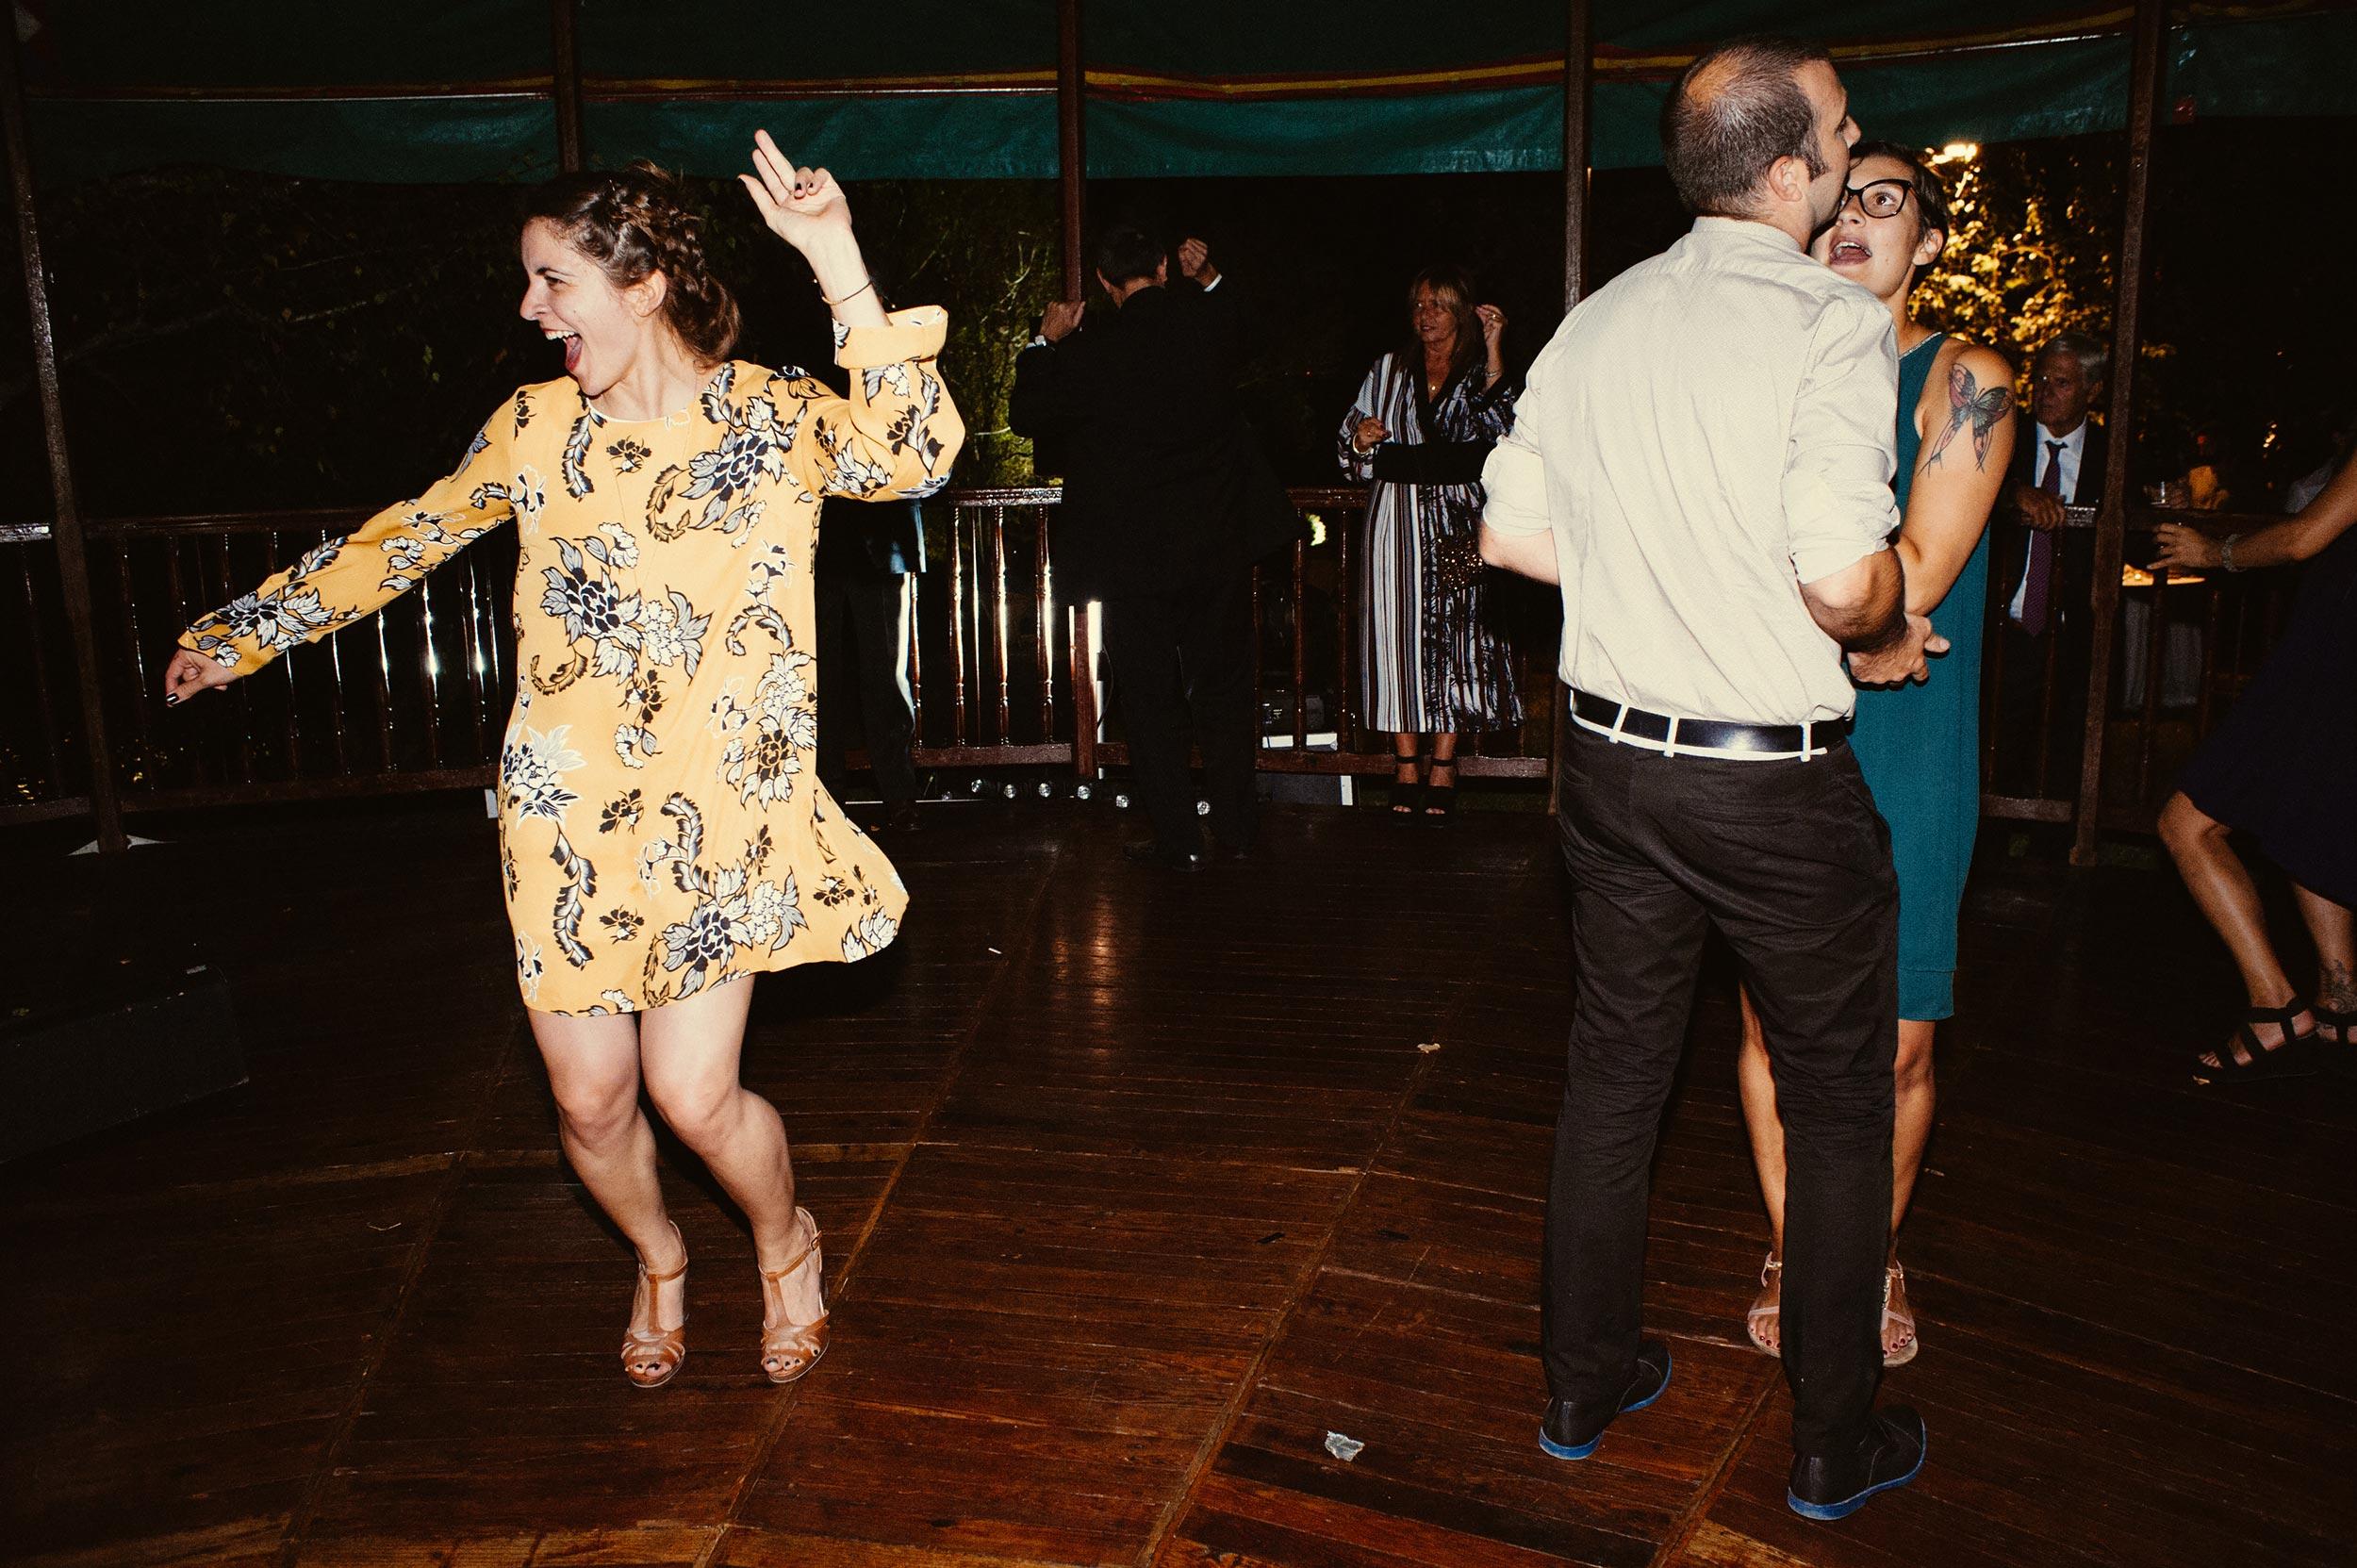 2016-Davor-Chiara-Monferrato-Asti-Vercelli-Wedding-Photographer-Italy-Alessandro-Avenali-122.jpg